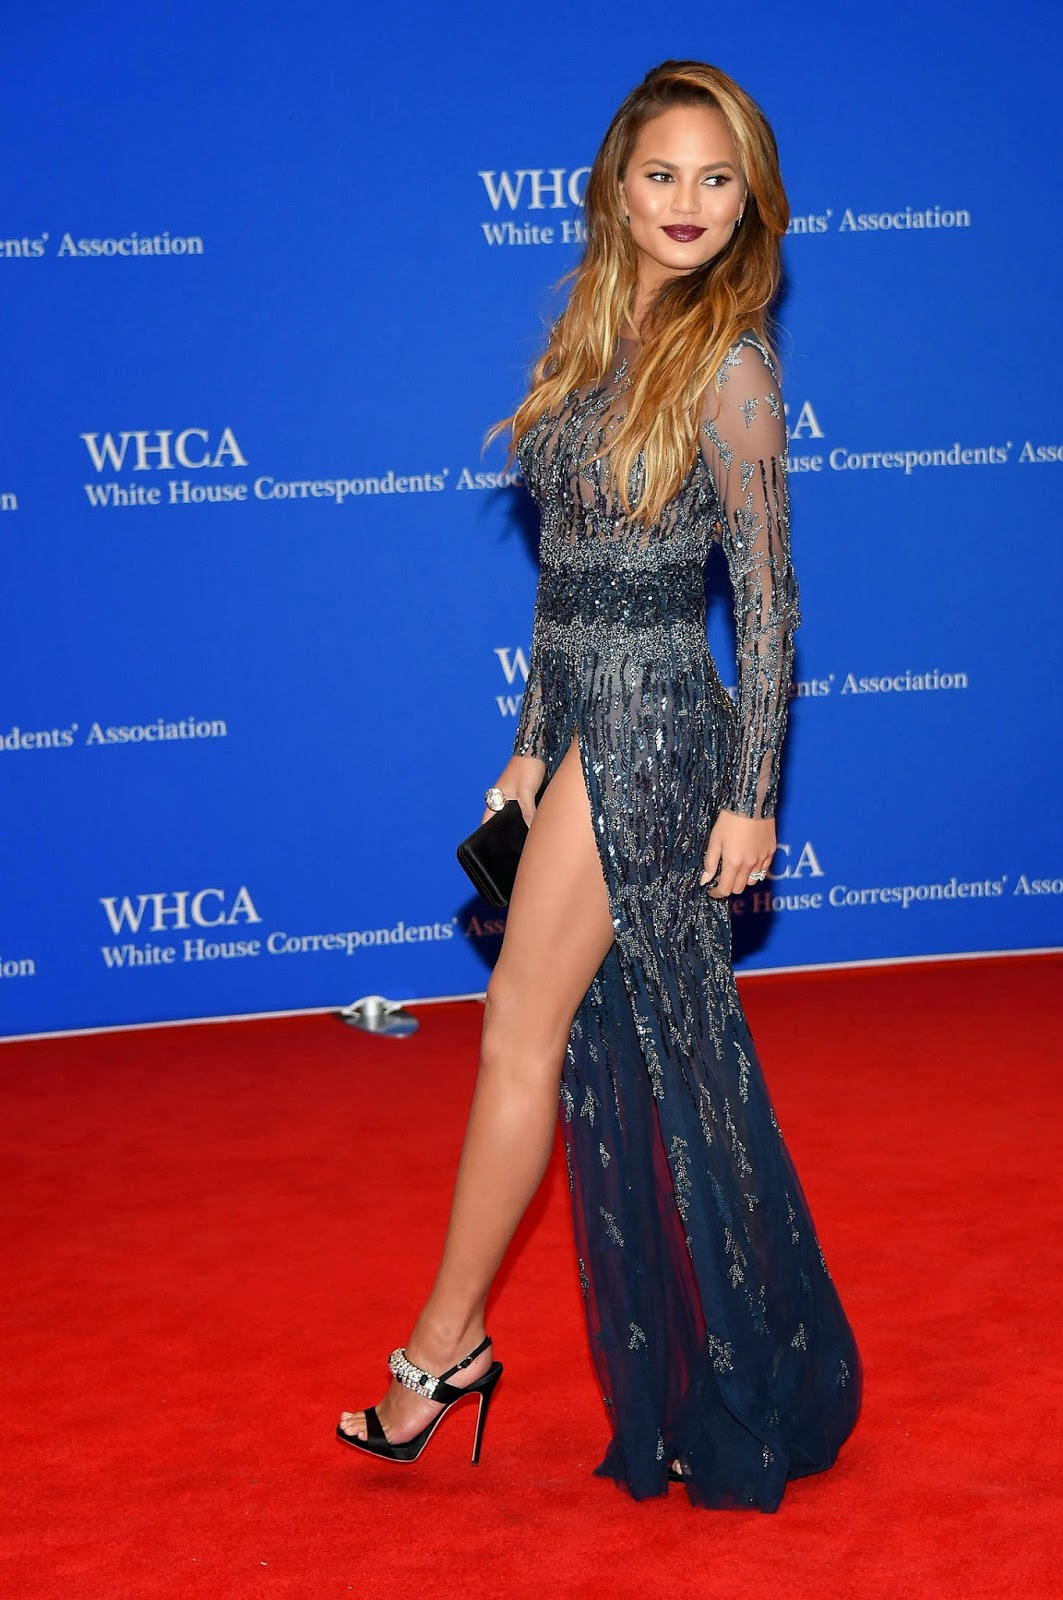 Chrissy Teigen Shows Off Legs For The 2015 White House